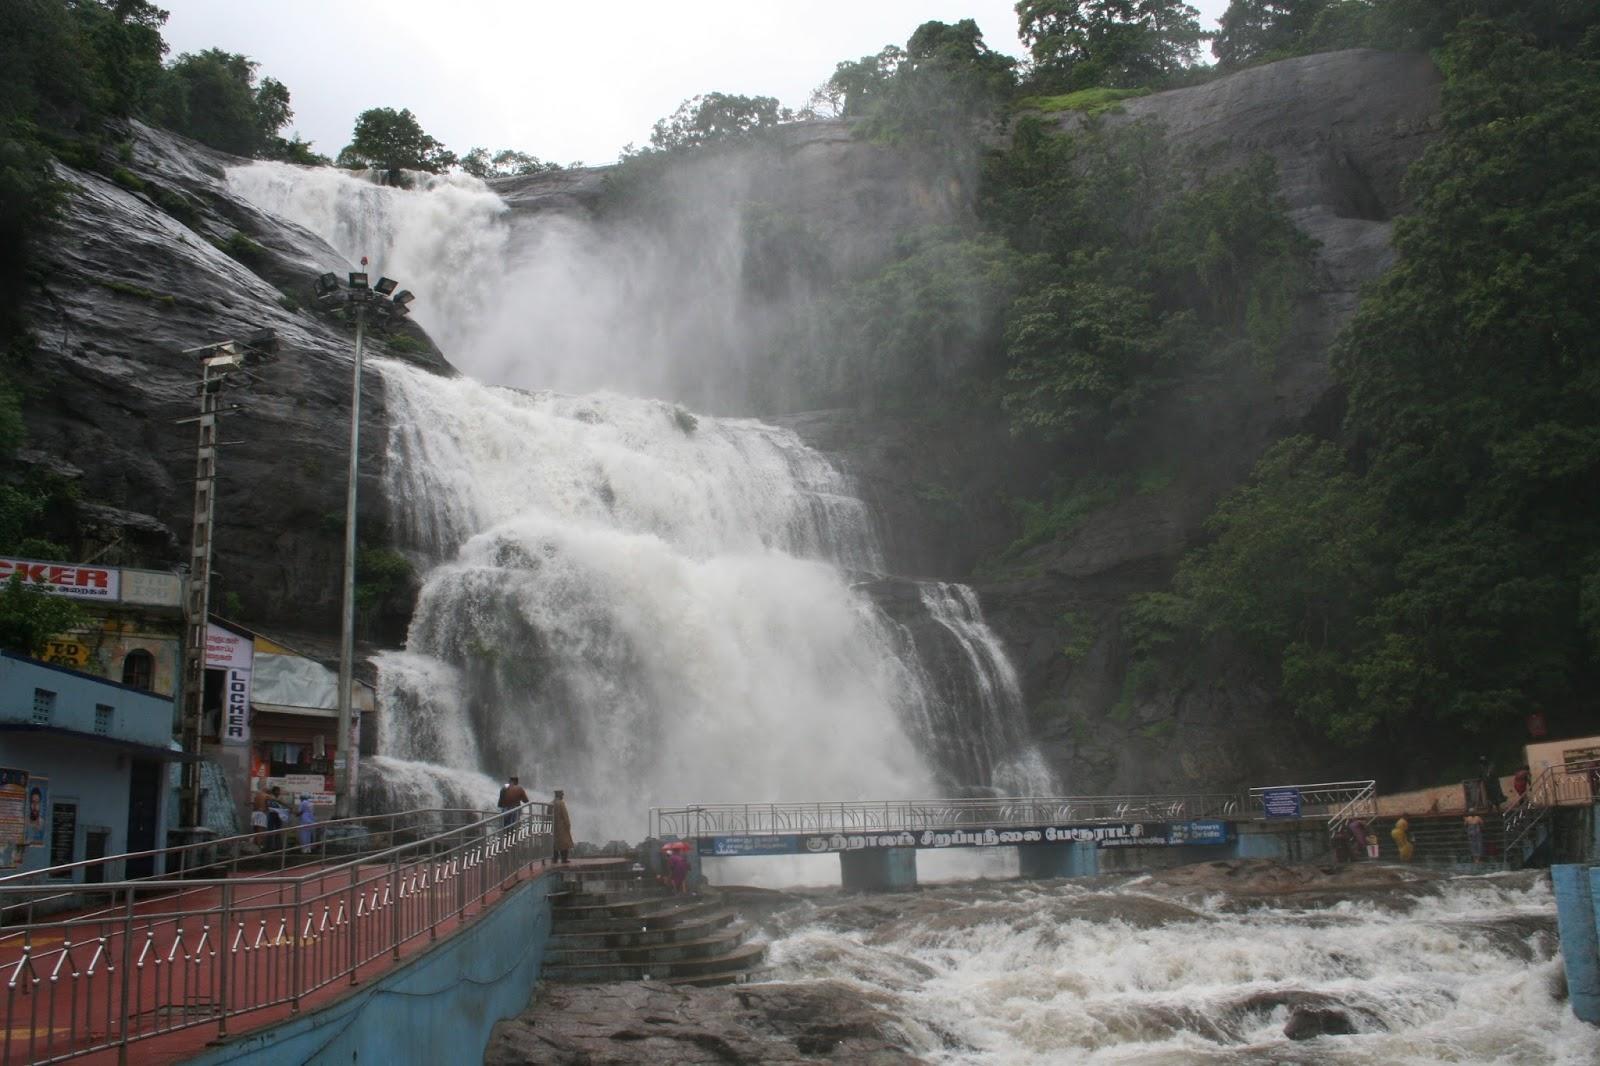 kutralam falls க்கான பட முடிவு